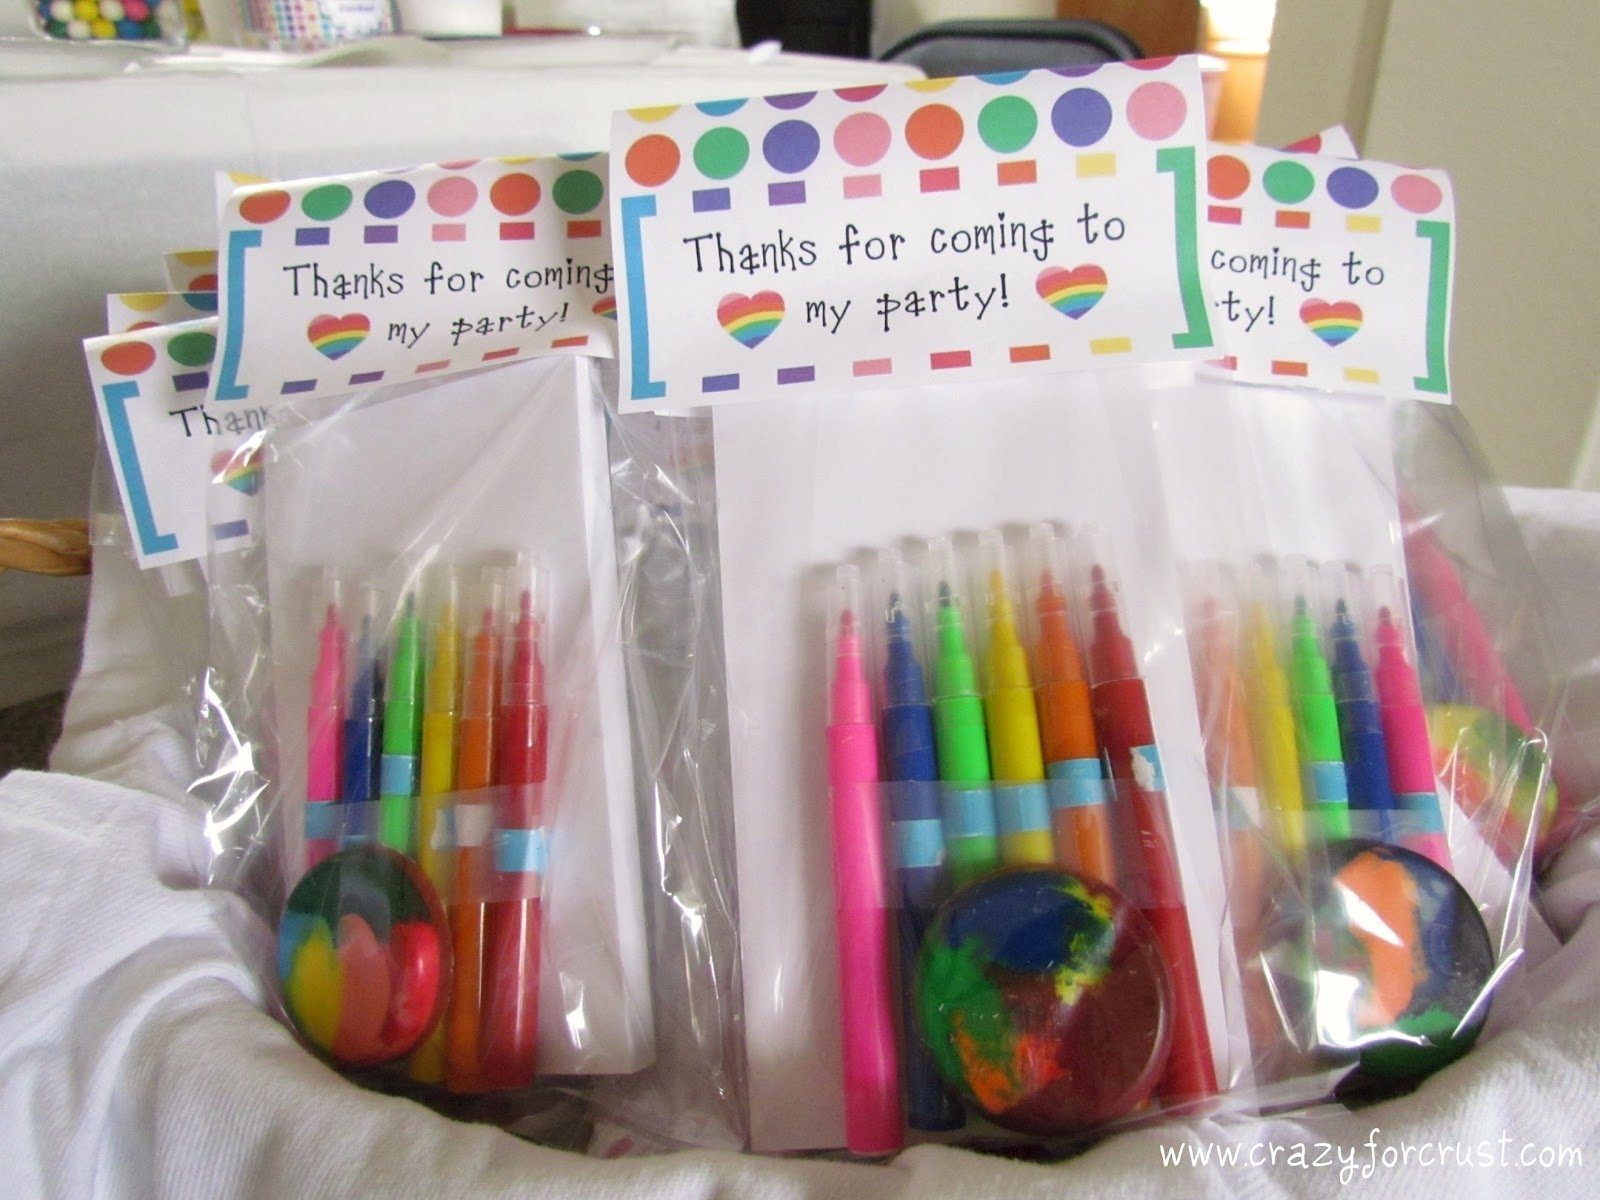 10 Wonderful Birthday Party Goodie Bag Ideas 51 items for goody bags goodie bags idea jen joes design goodie 2021